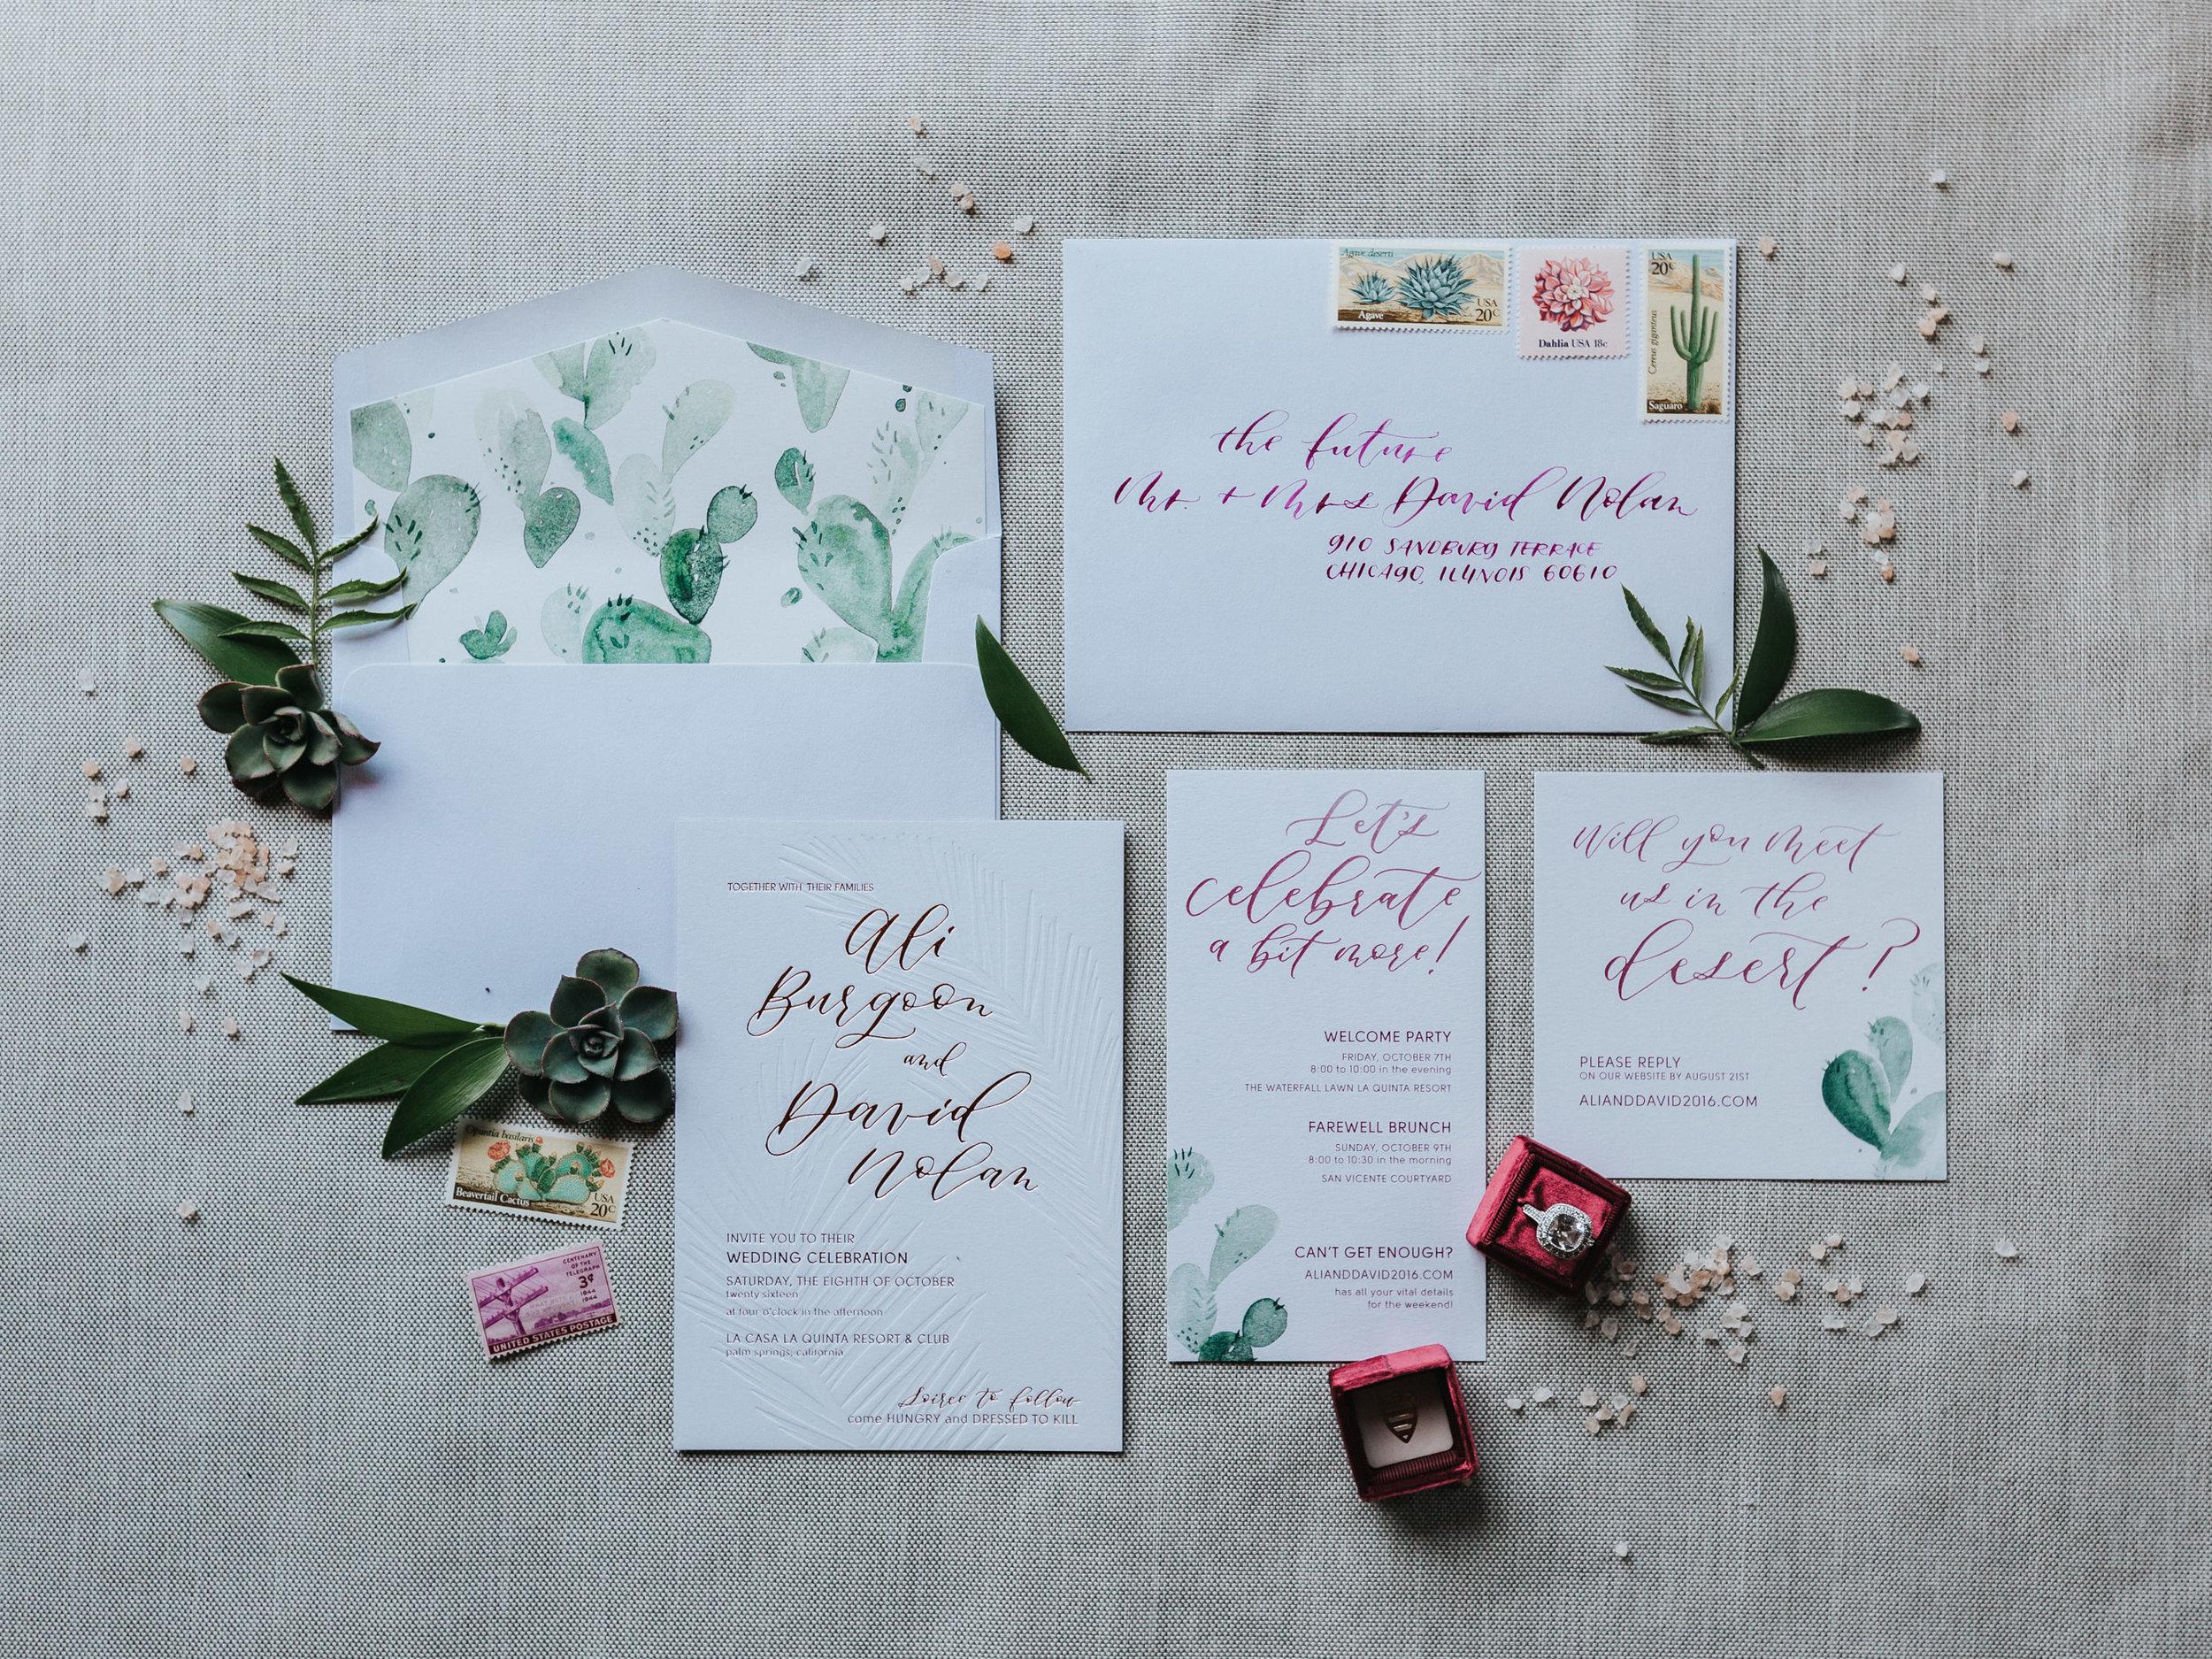 palm springs wedding ideas